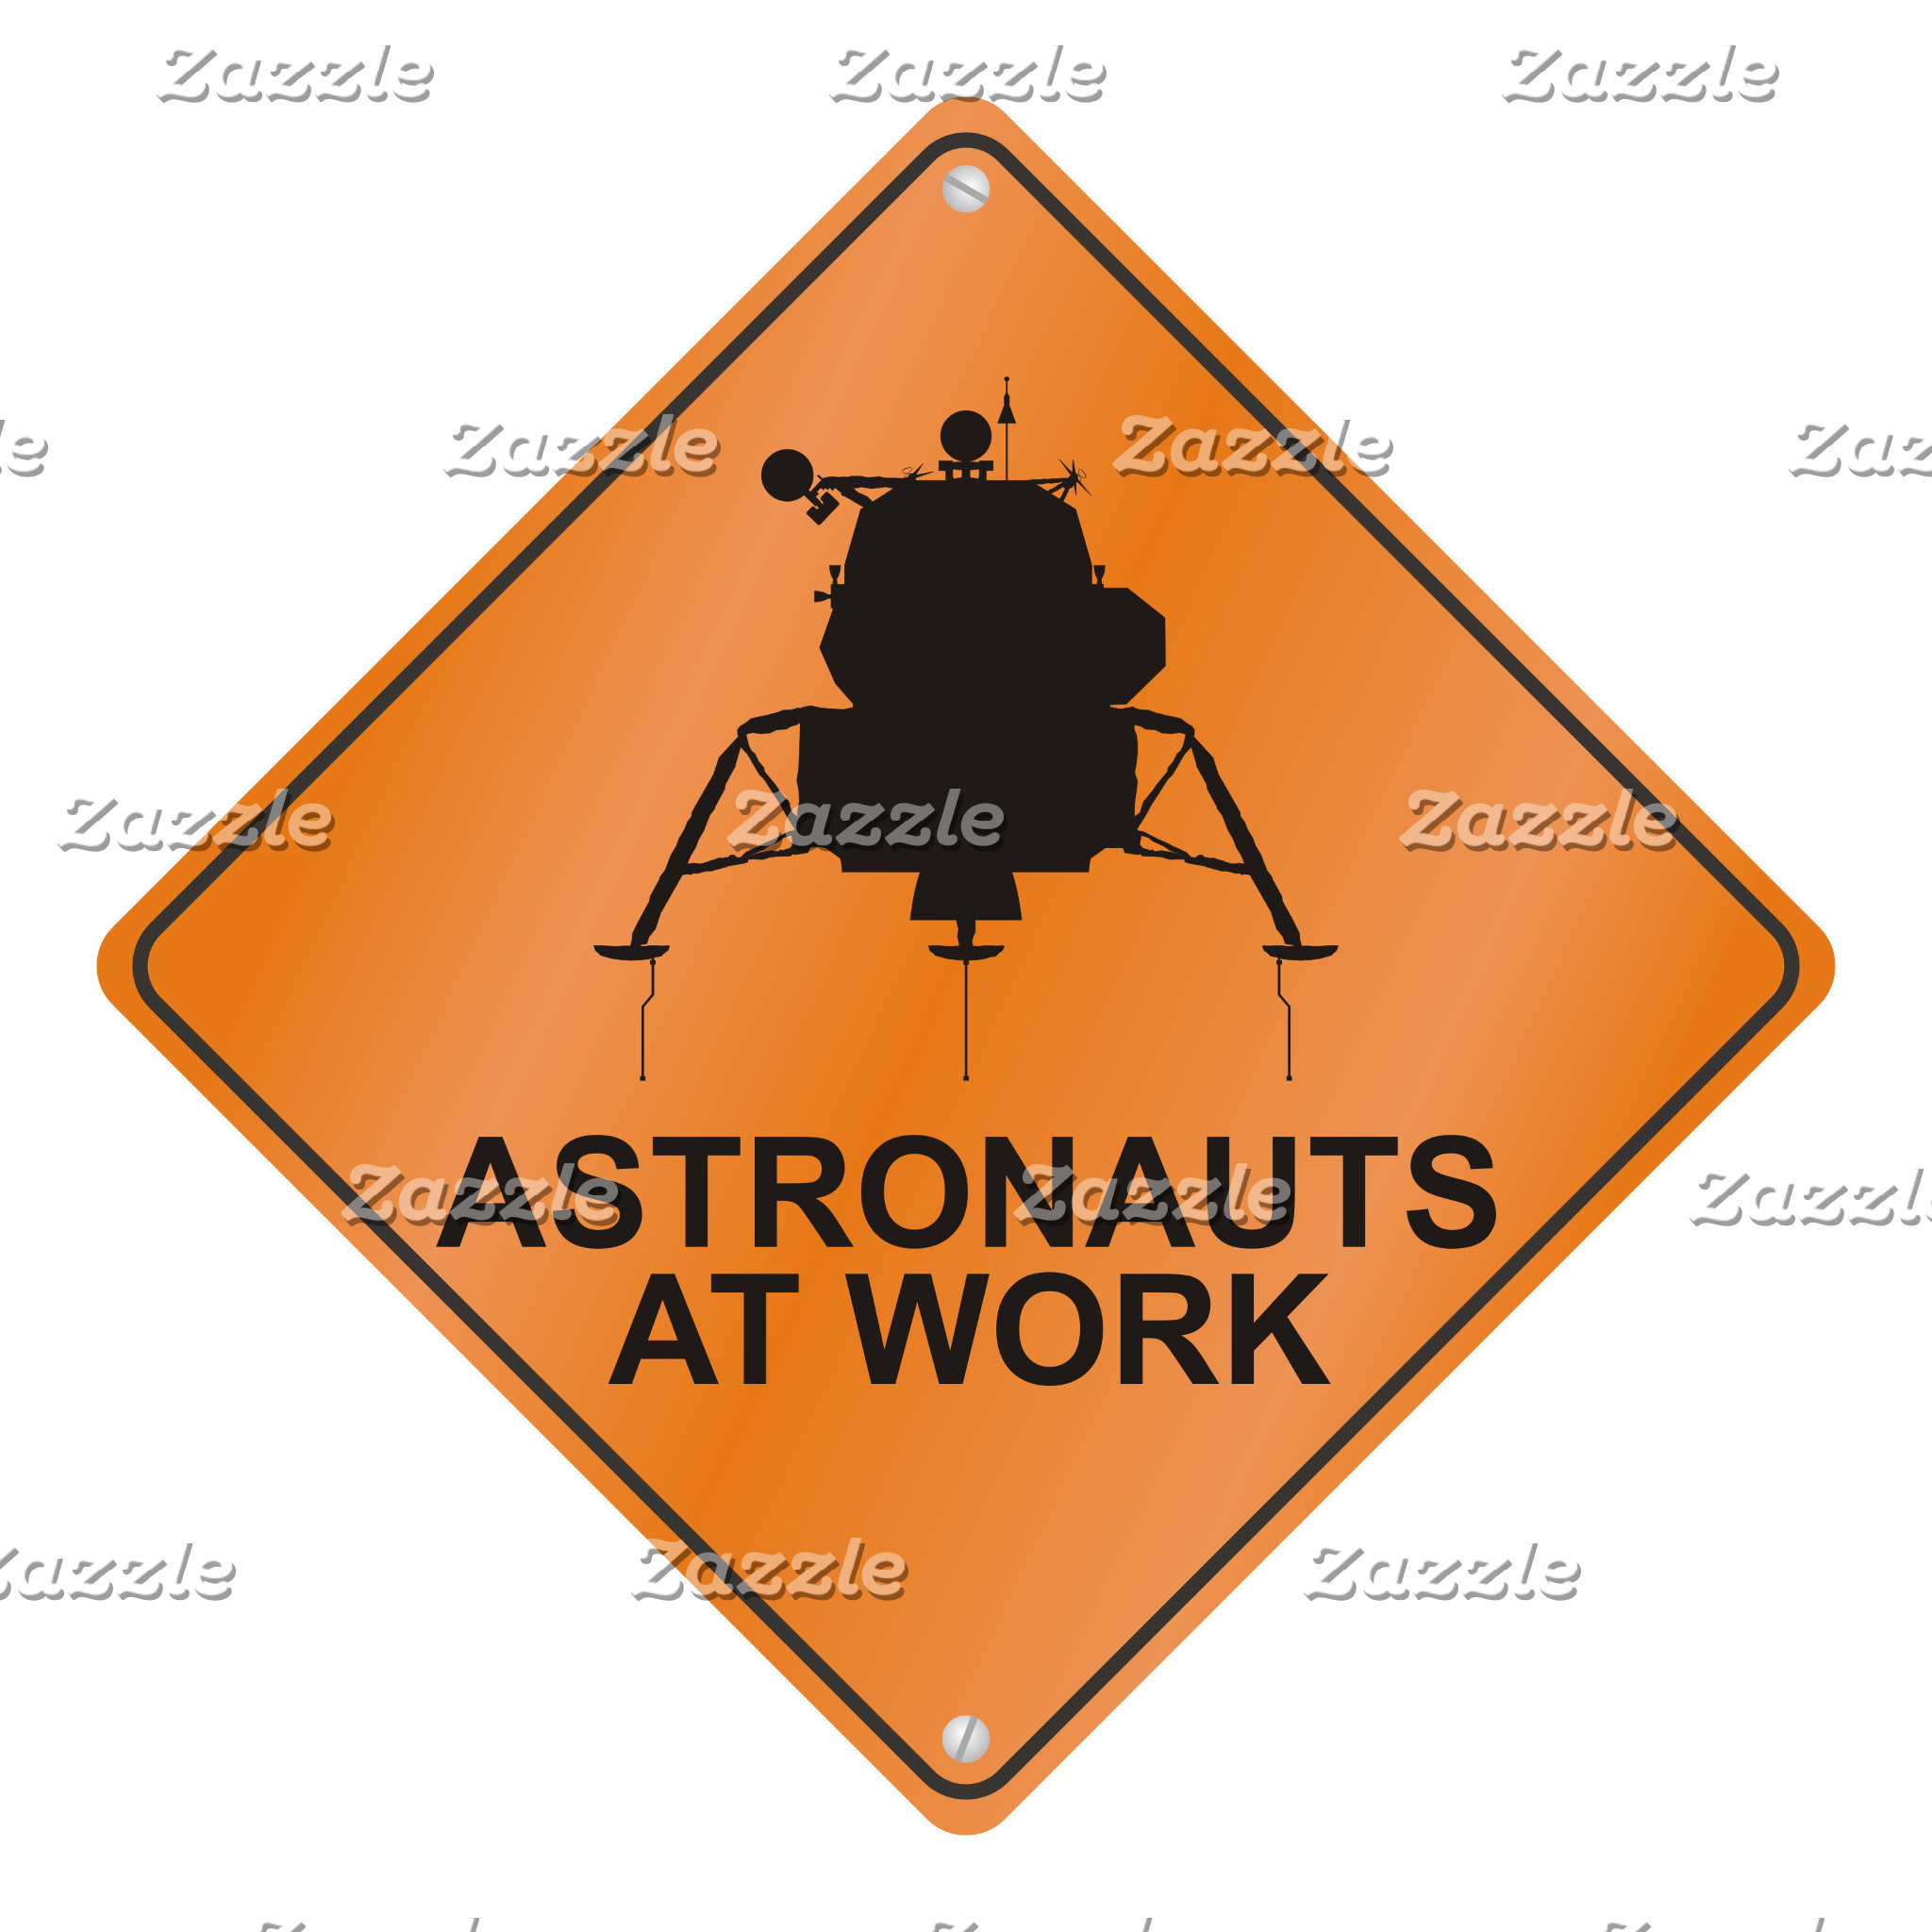 Lunar Module / Work